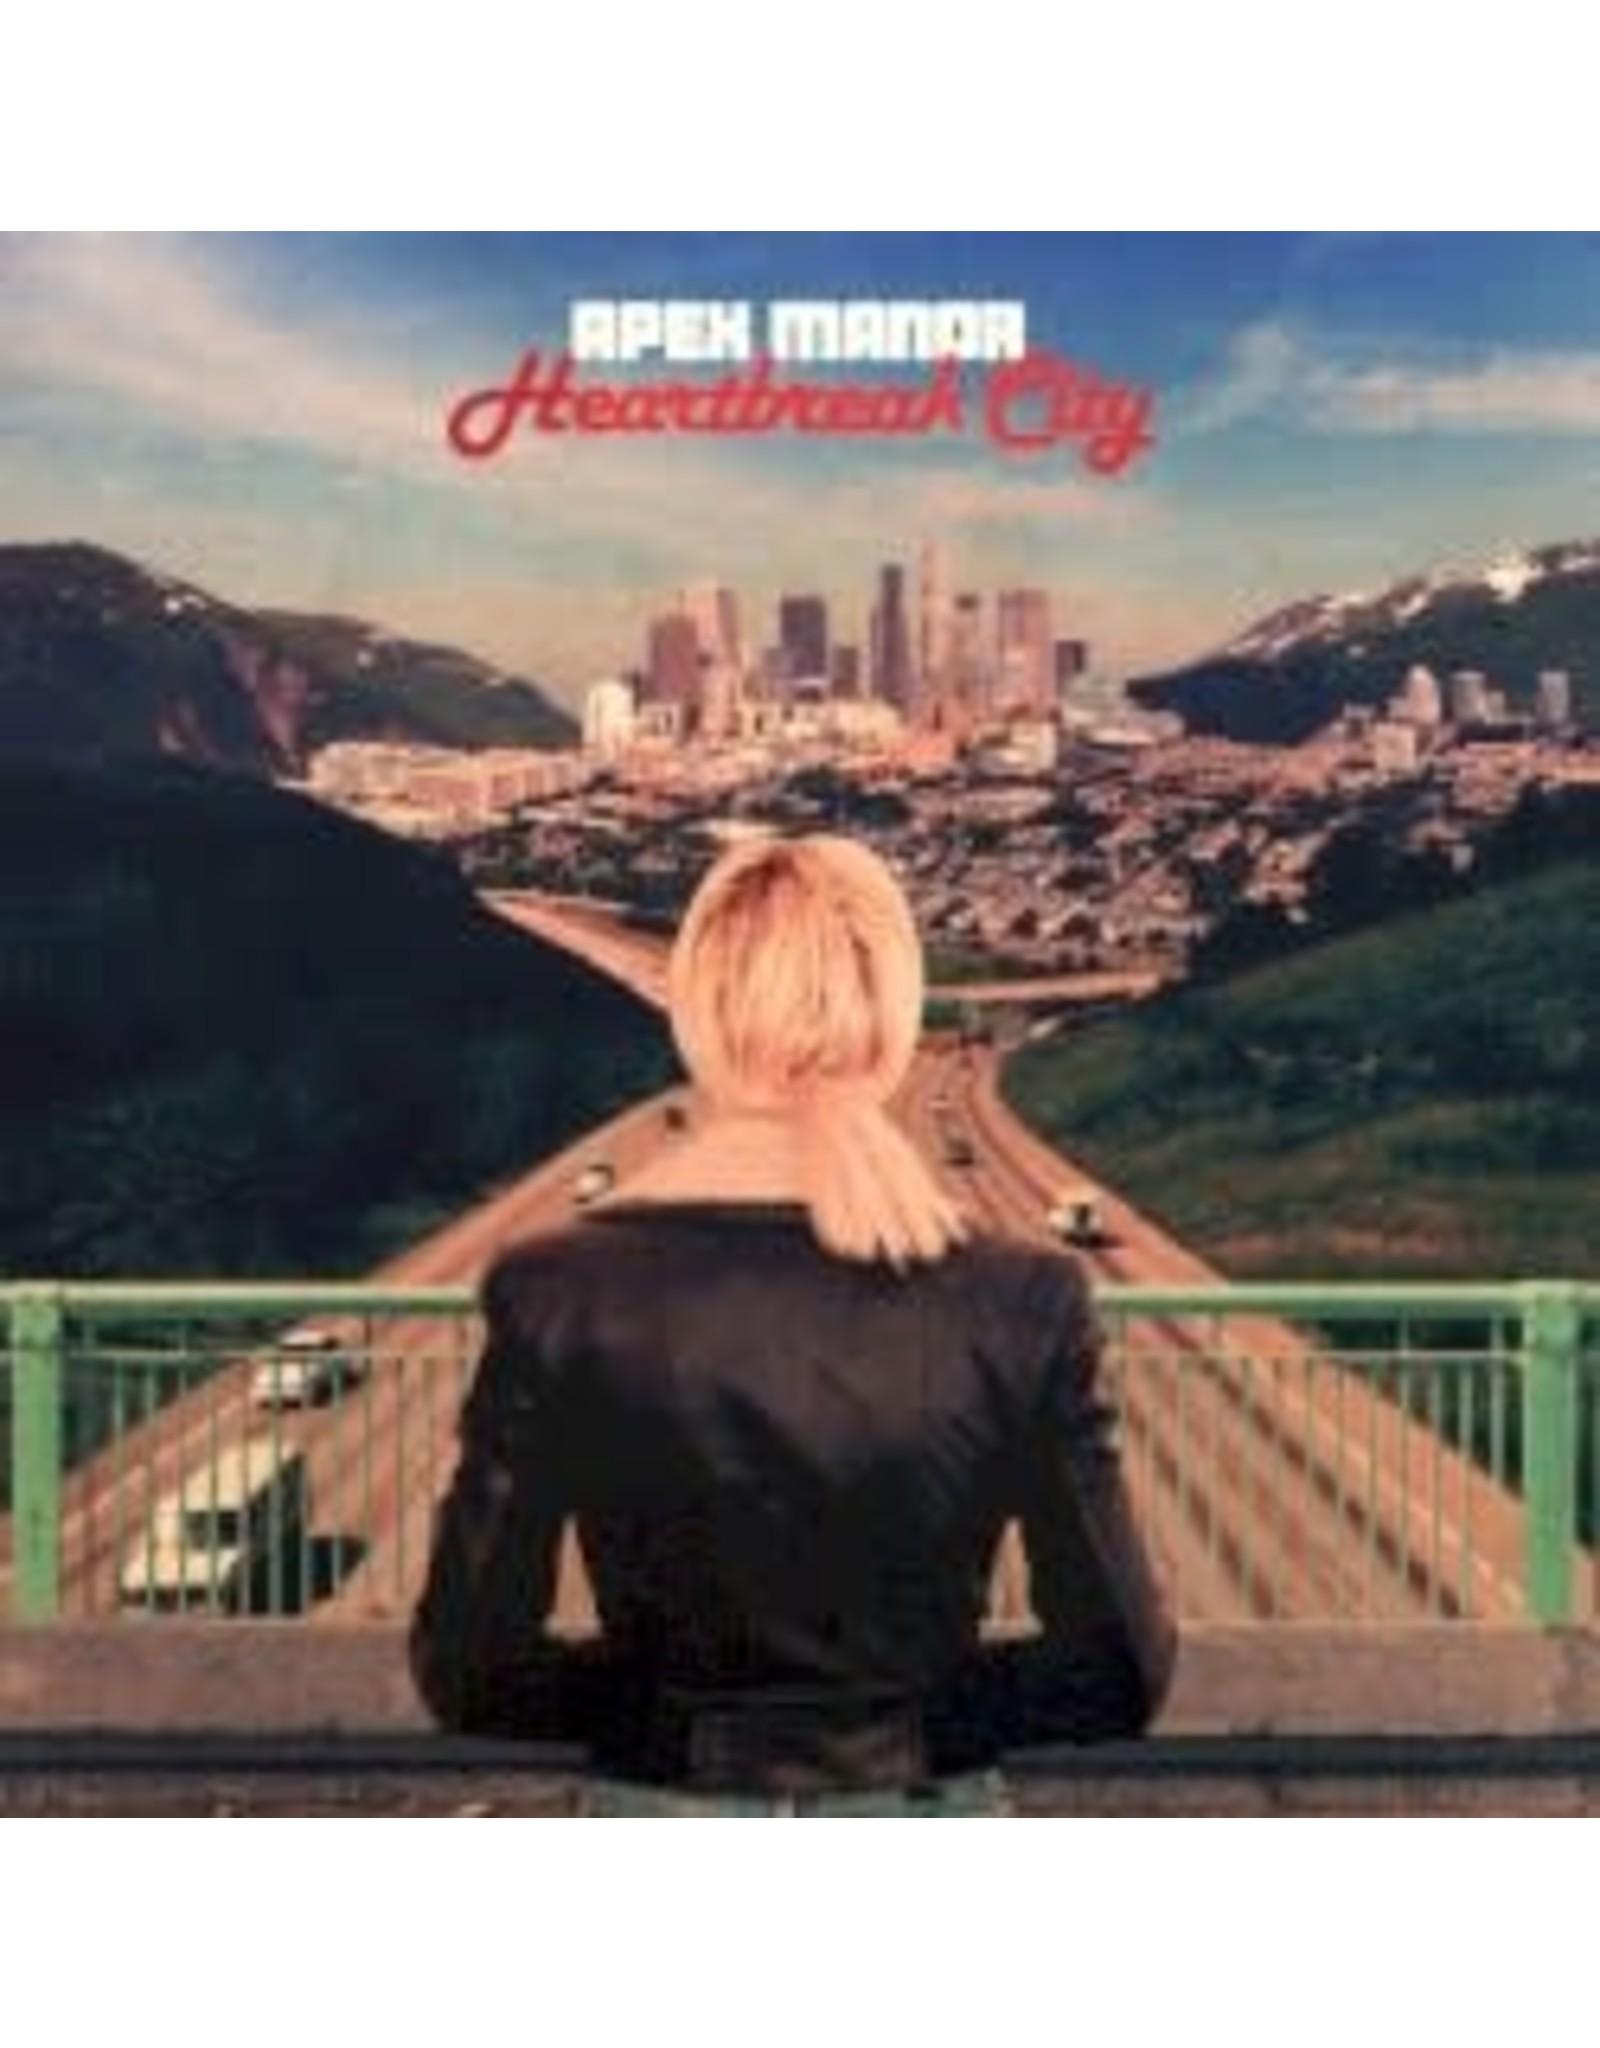 Apex Manor - Heartbreak City (Ltd Red Vinyl) LP